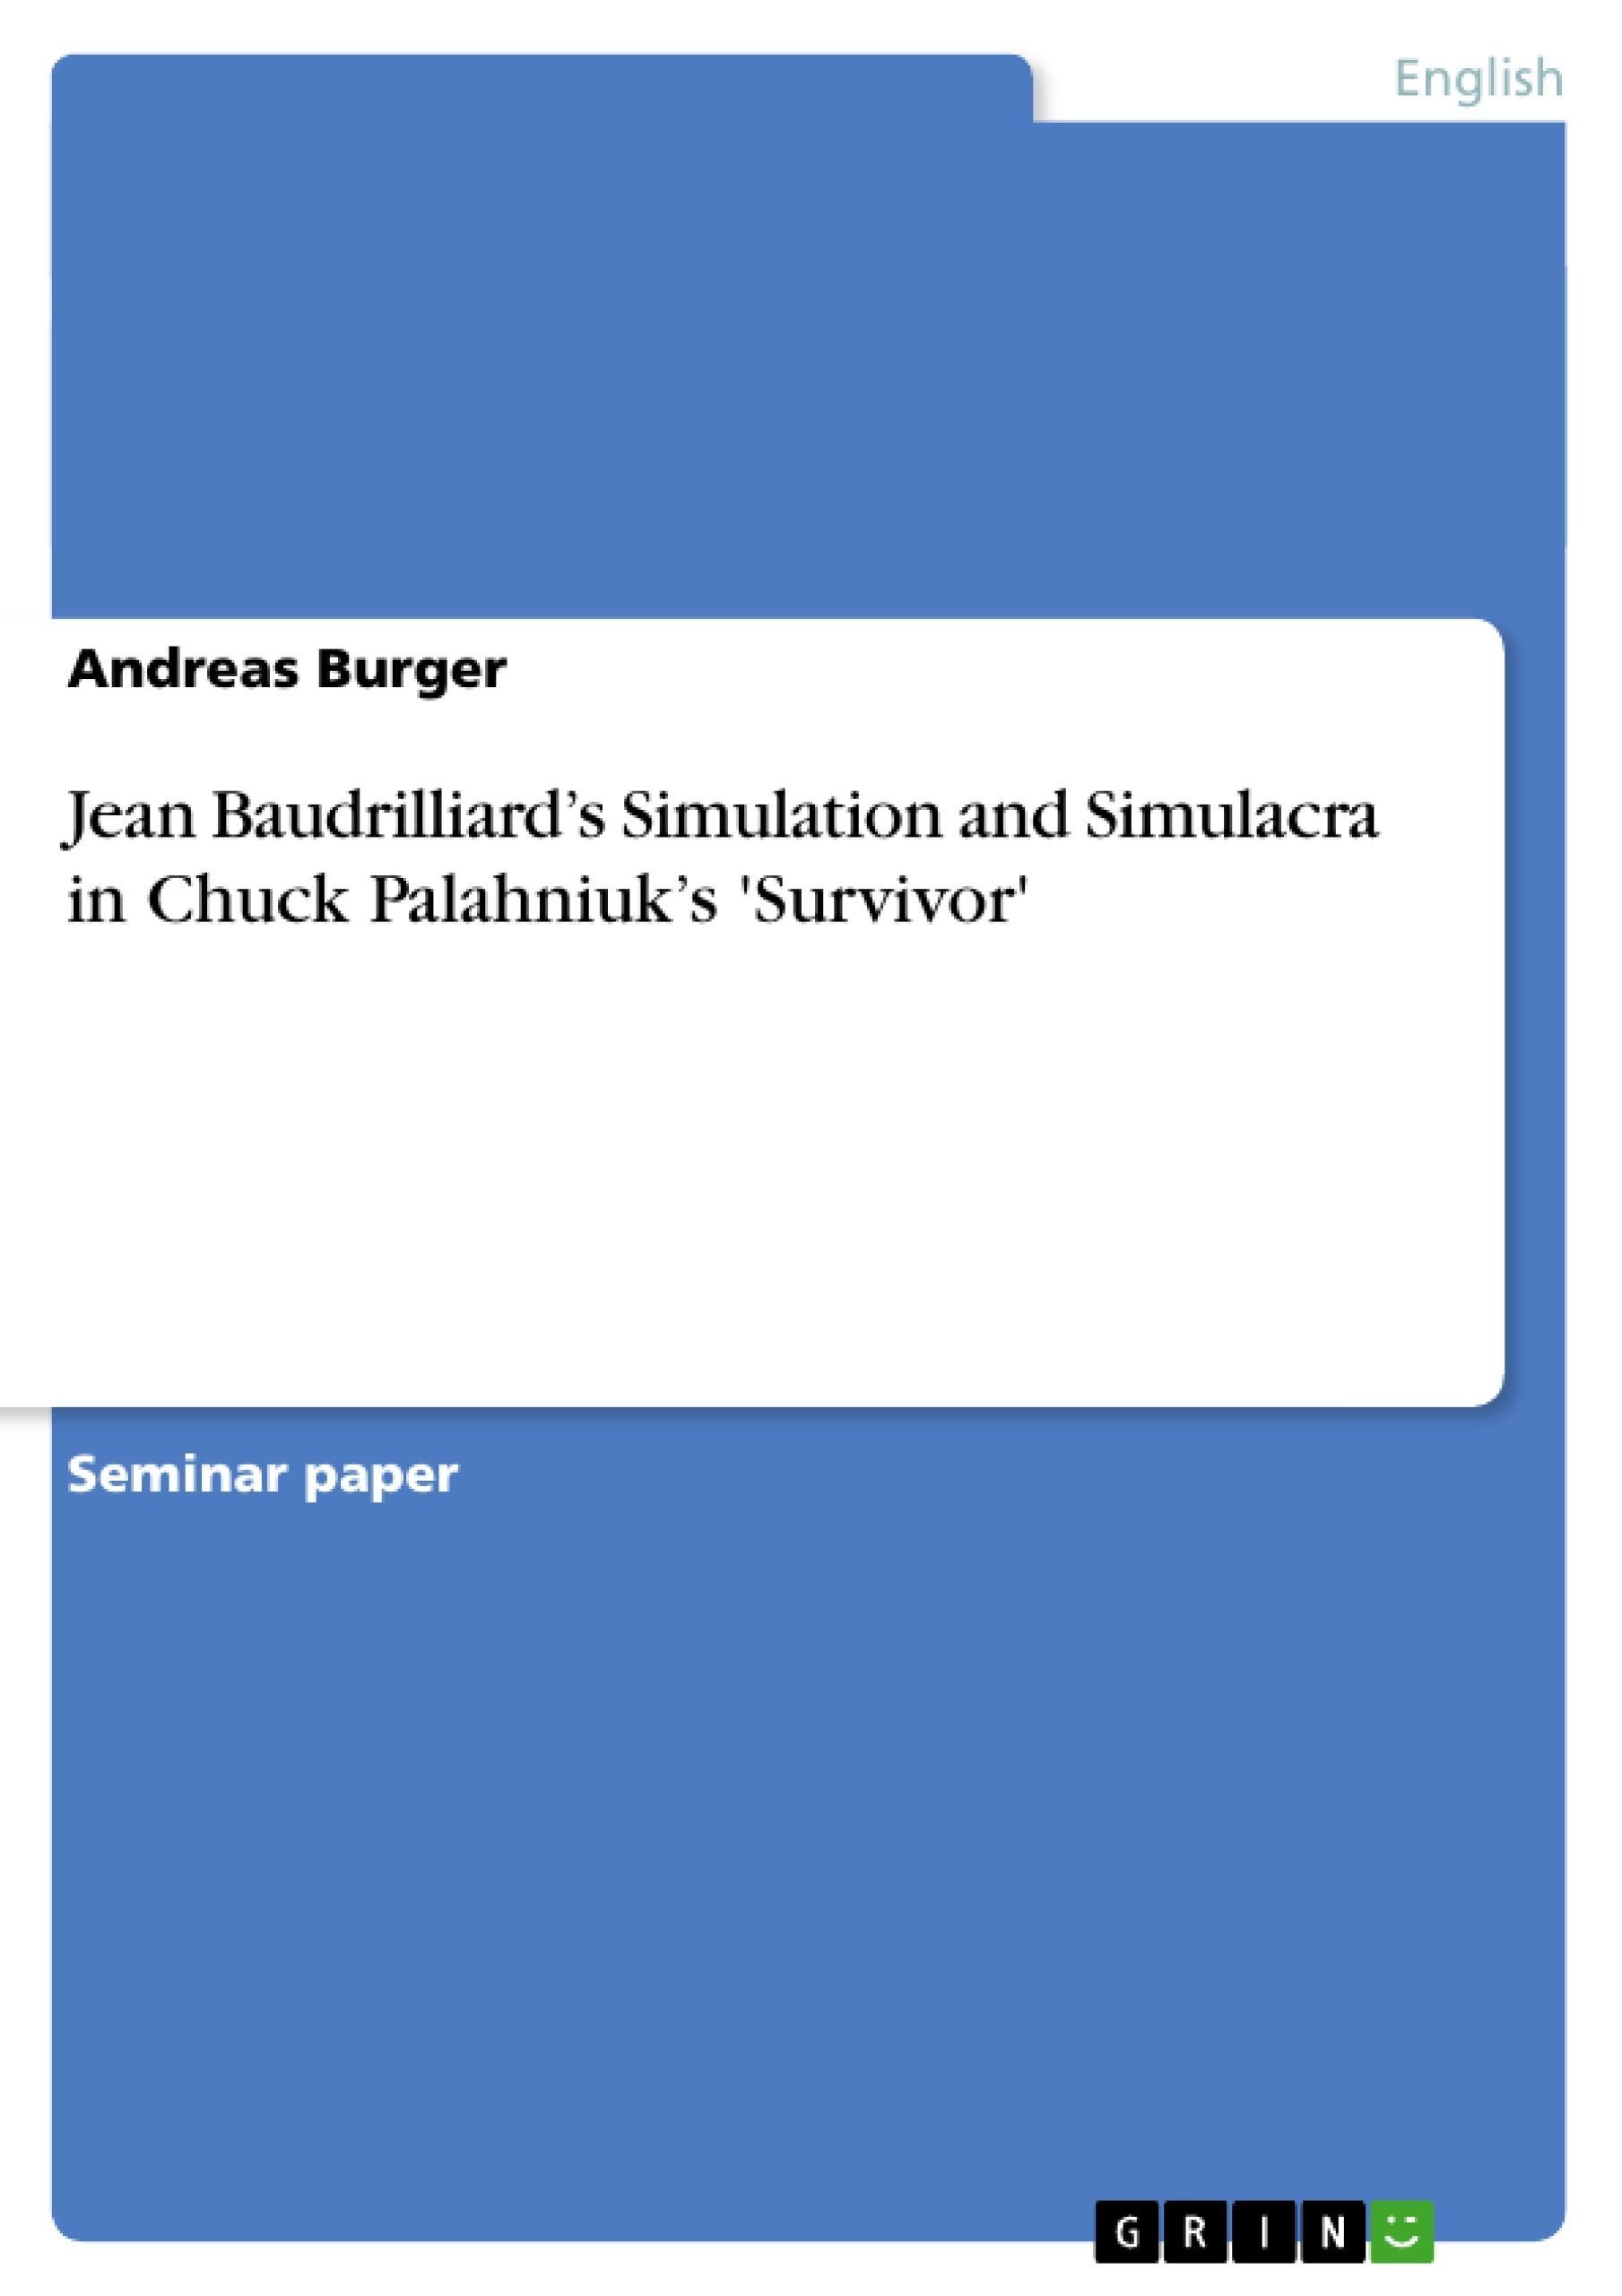 Dissertation by chuck palahniuk